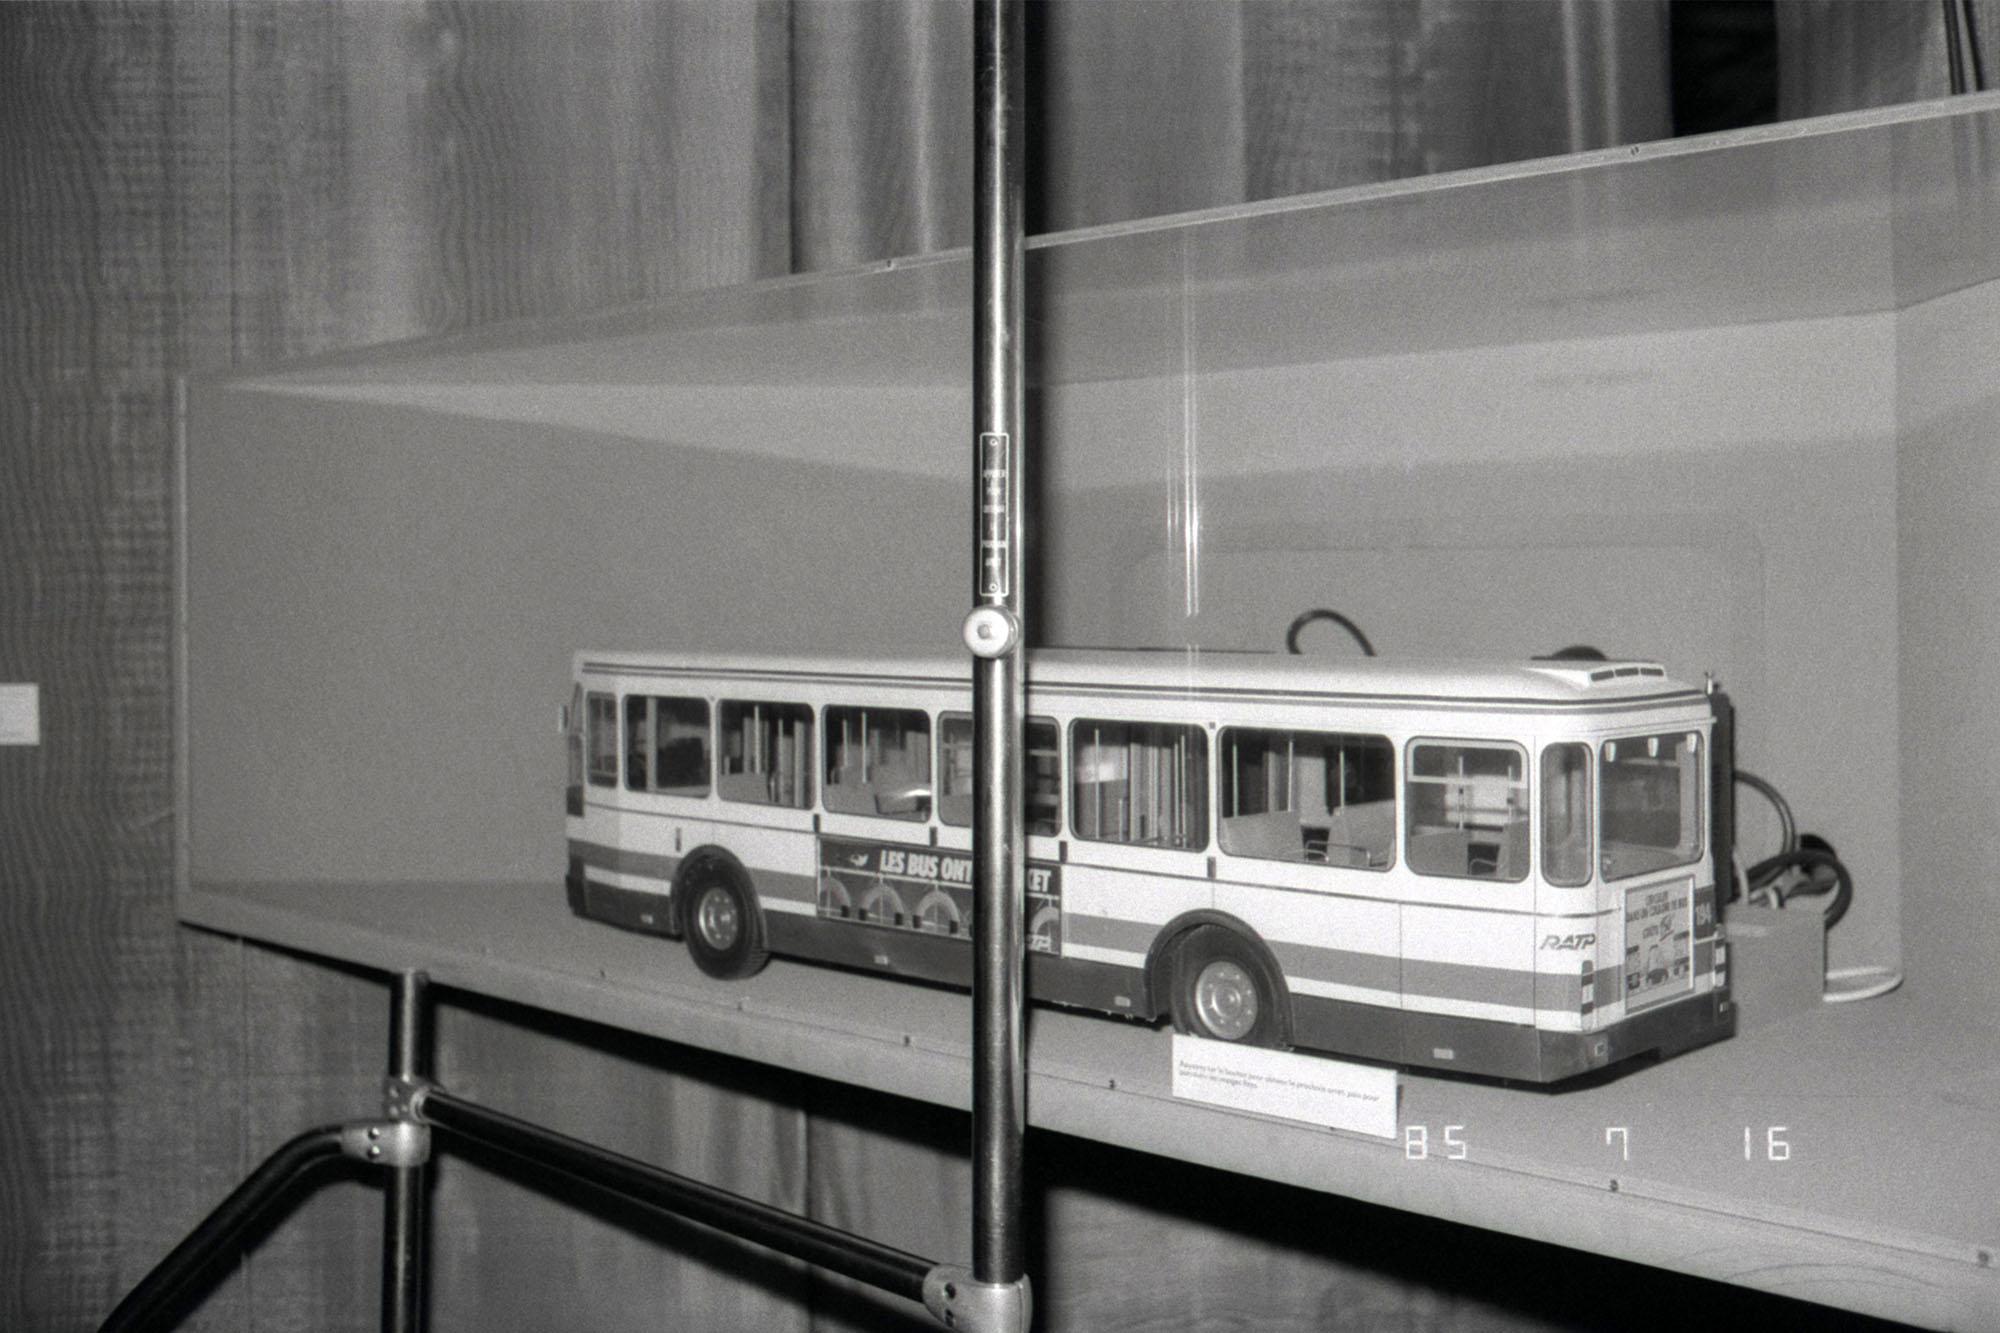 le bus immateriaux 1985 jlb blog